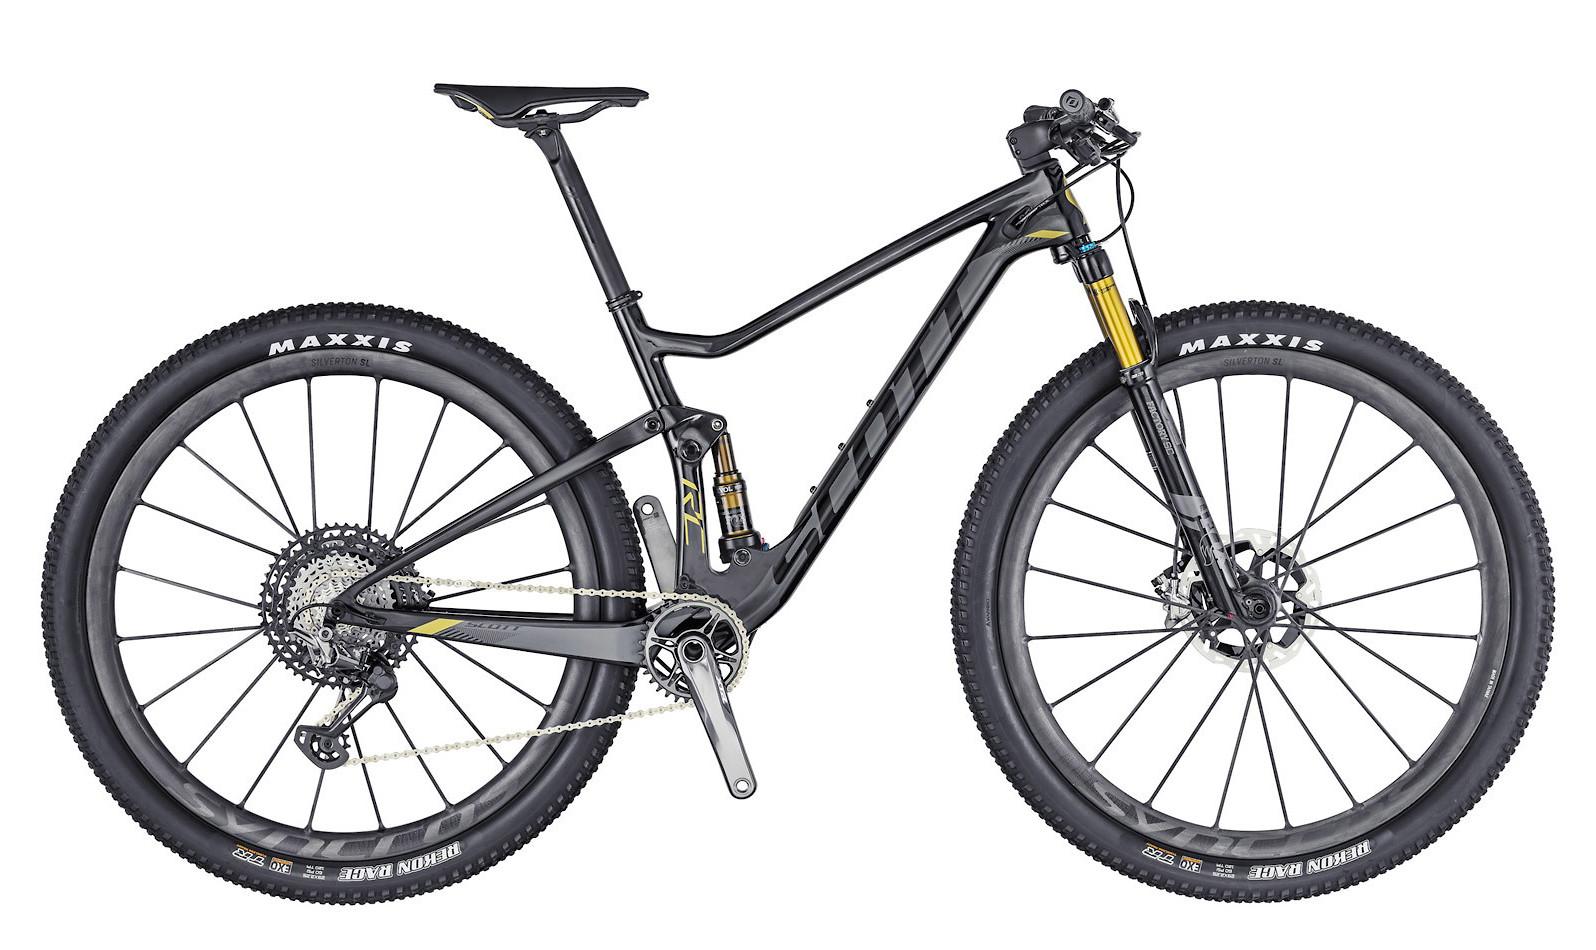 2019 Scott Spark RC 900 SL Bike